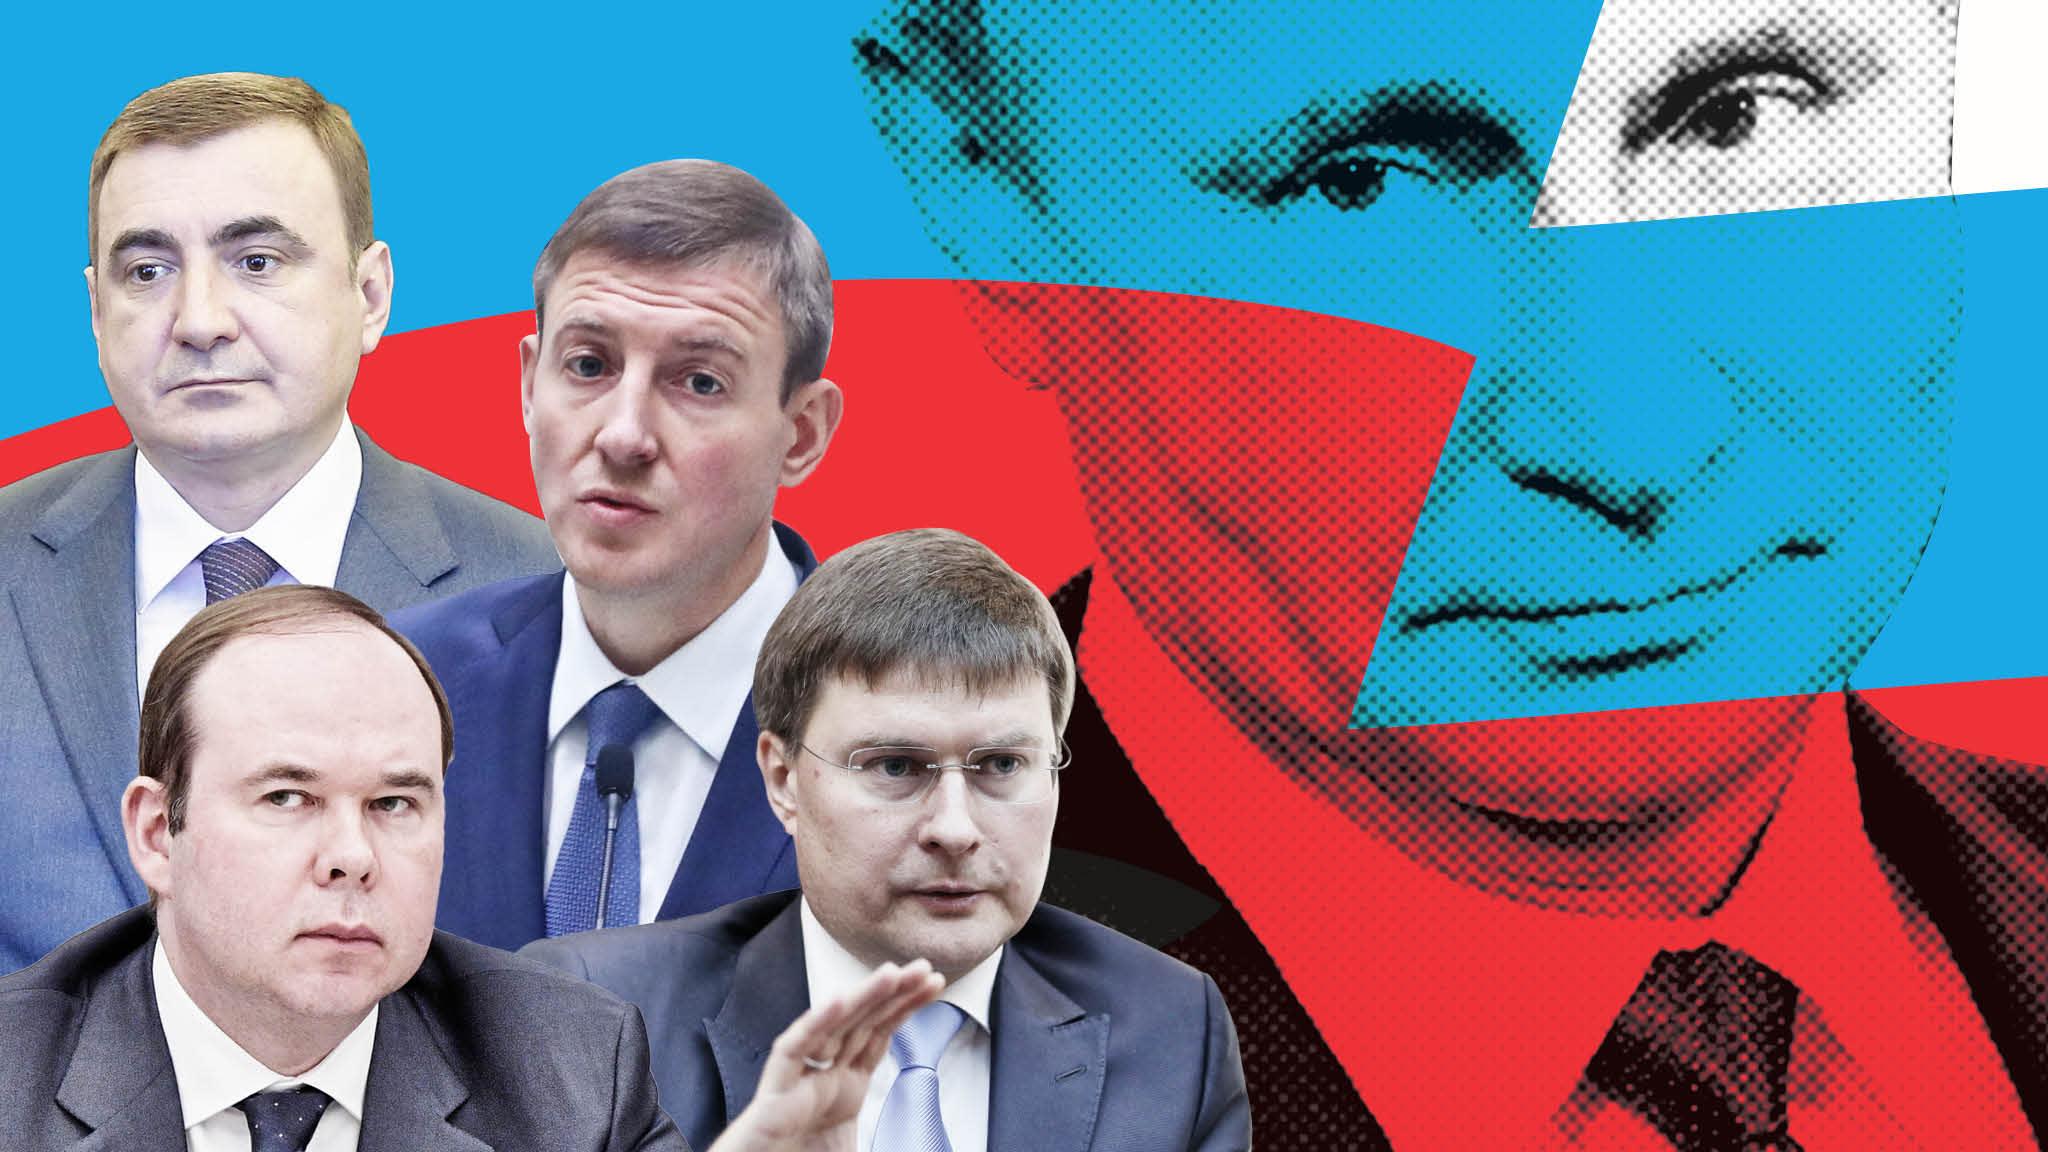 Russian election: Meet Vladimir Putin's new technocrats